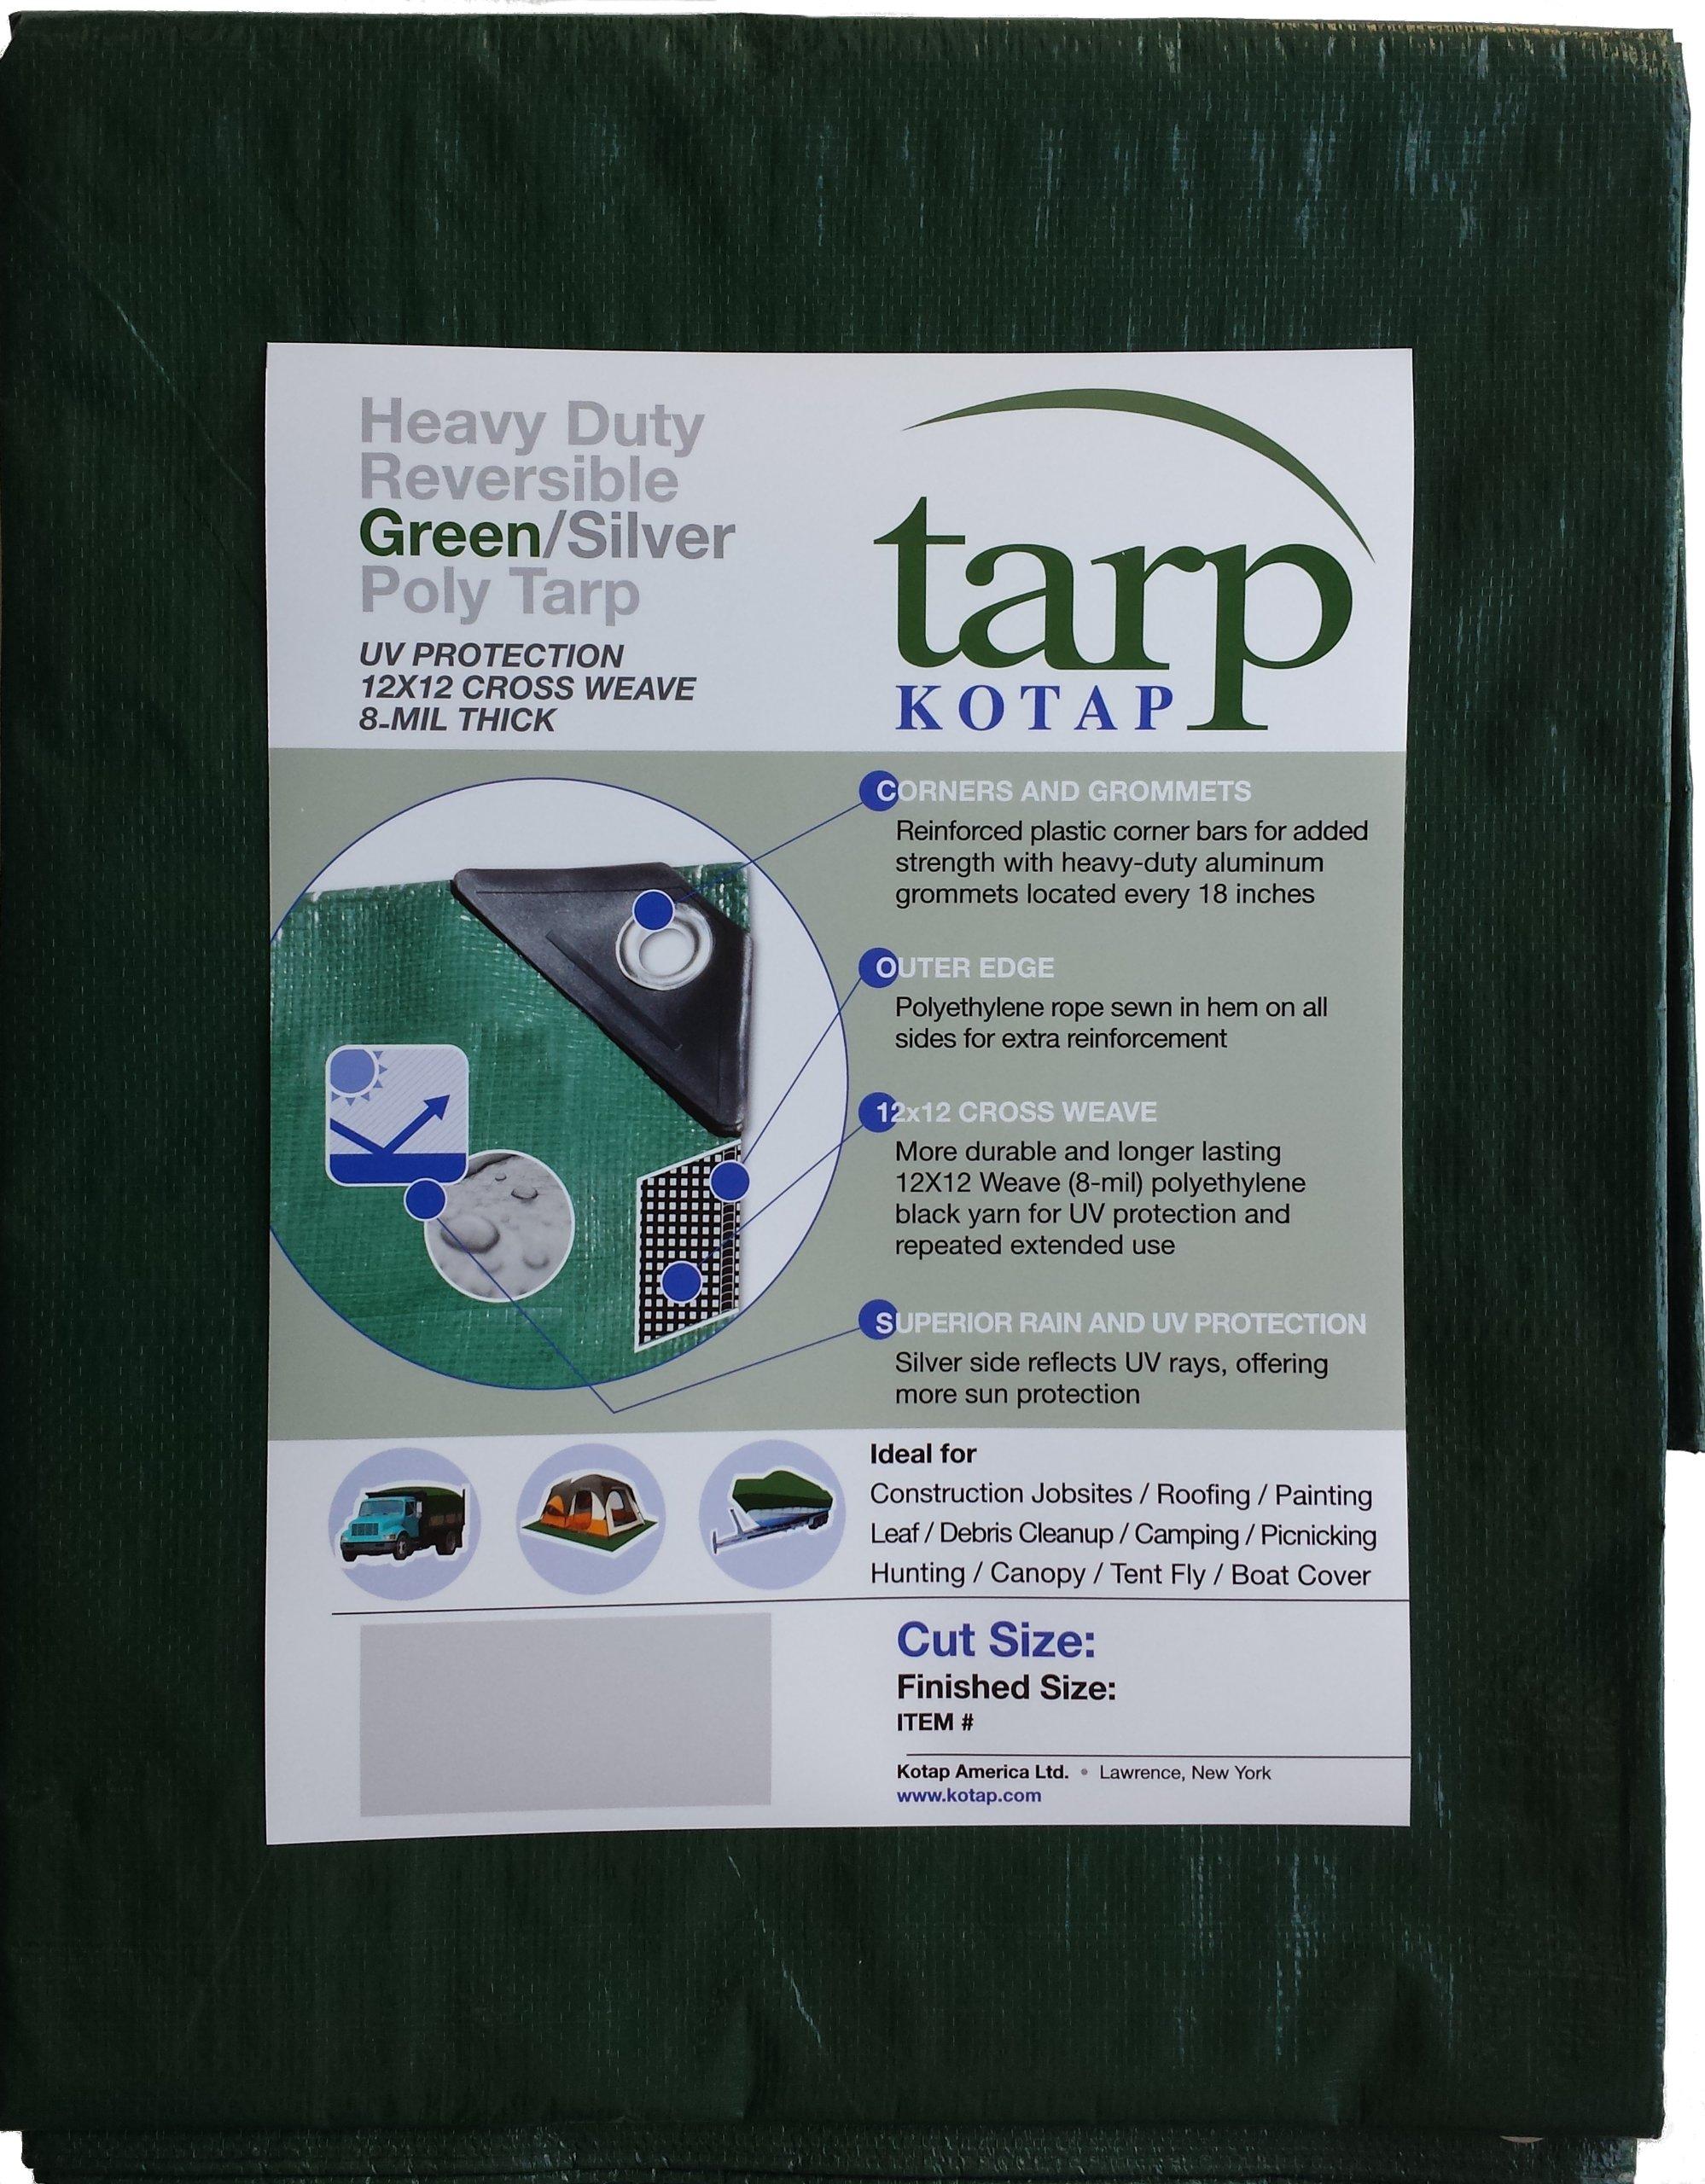 Kotap 50-ft x 50-ft Heavy-Duty 12 by 12 Cross Weave 8-mil Reversible Green/Silver Poly Tarp, Item: TGS-5050